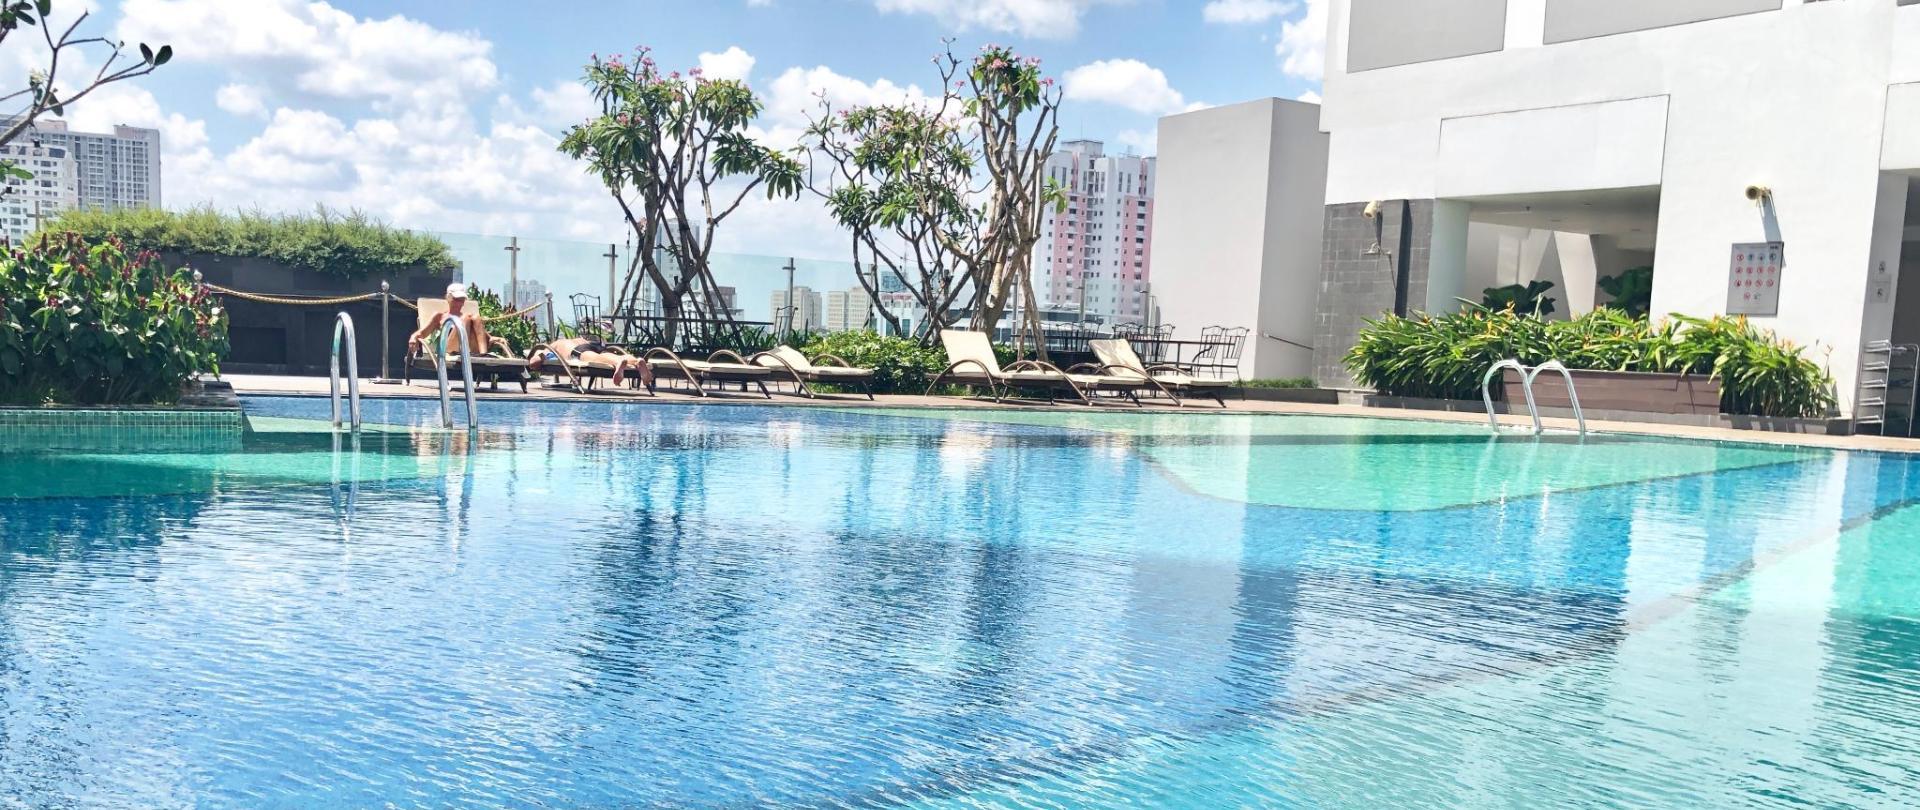 trip-apartment-saigon-pool.JPG